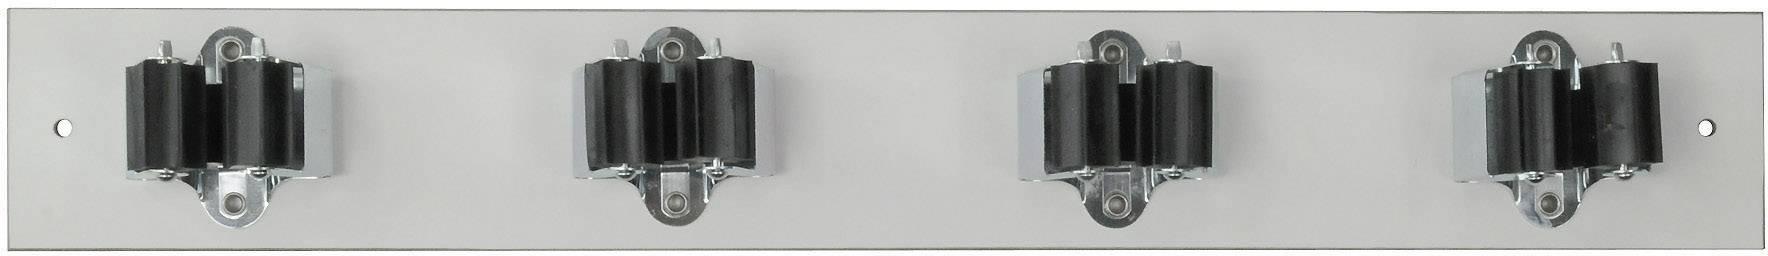 Lišta s držáky Prax 4-25W, Ø 25 mm, 440 x 60 mm